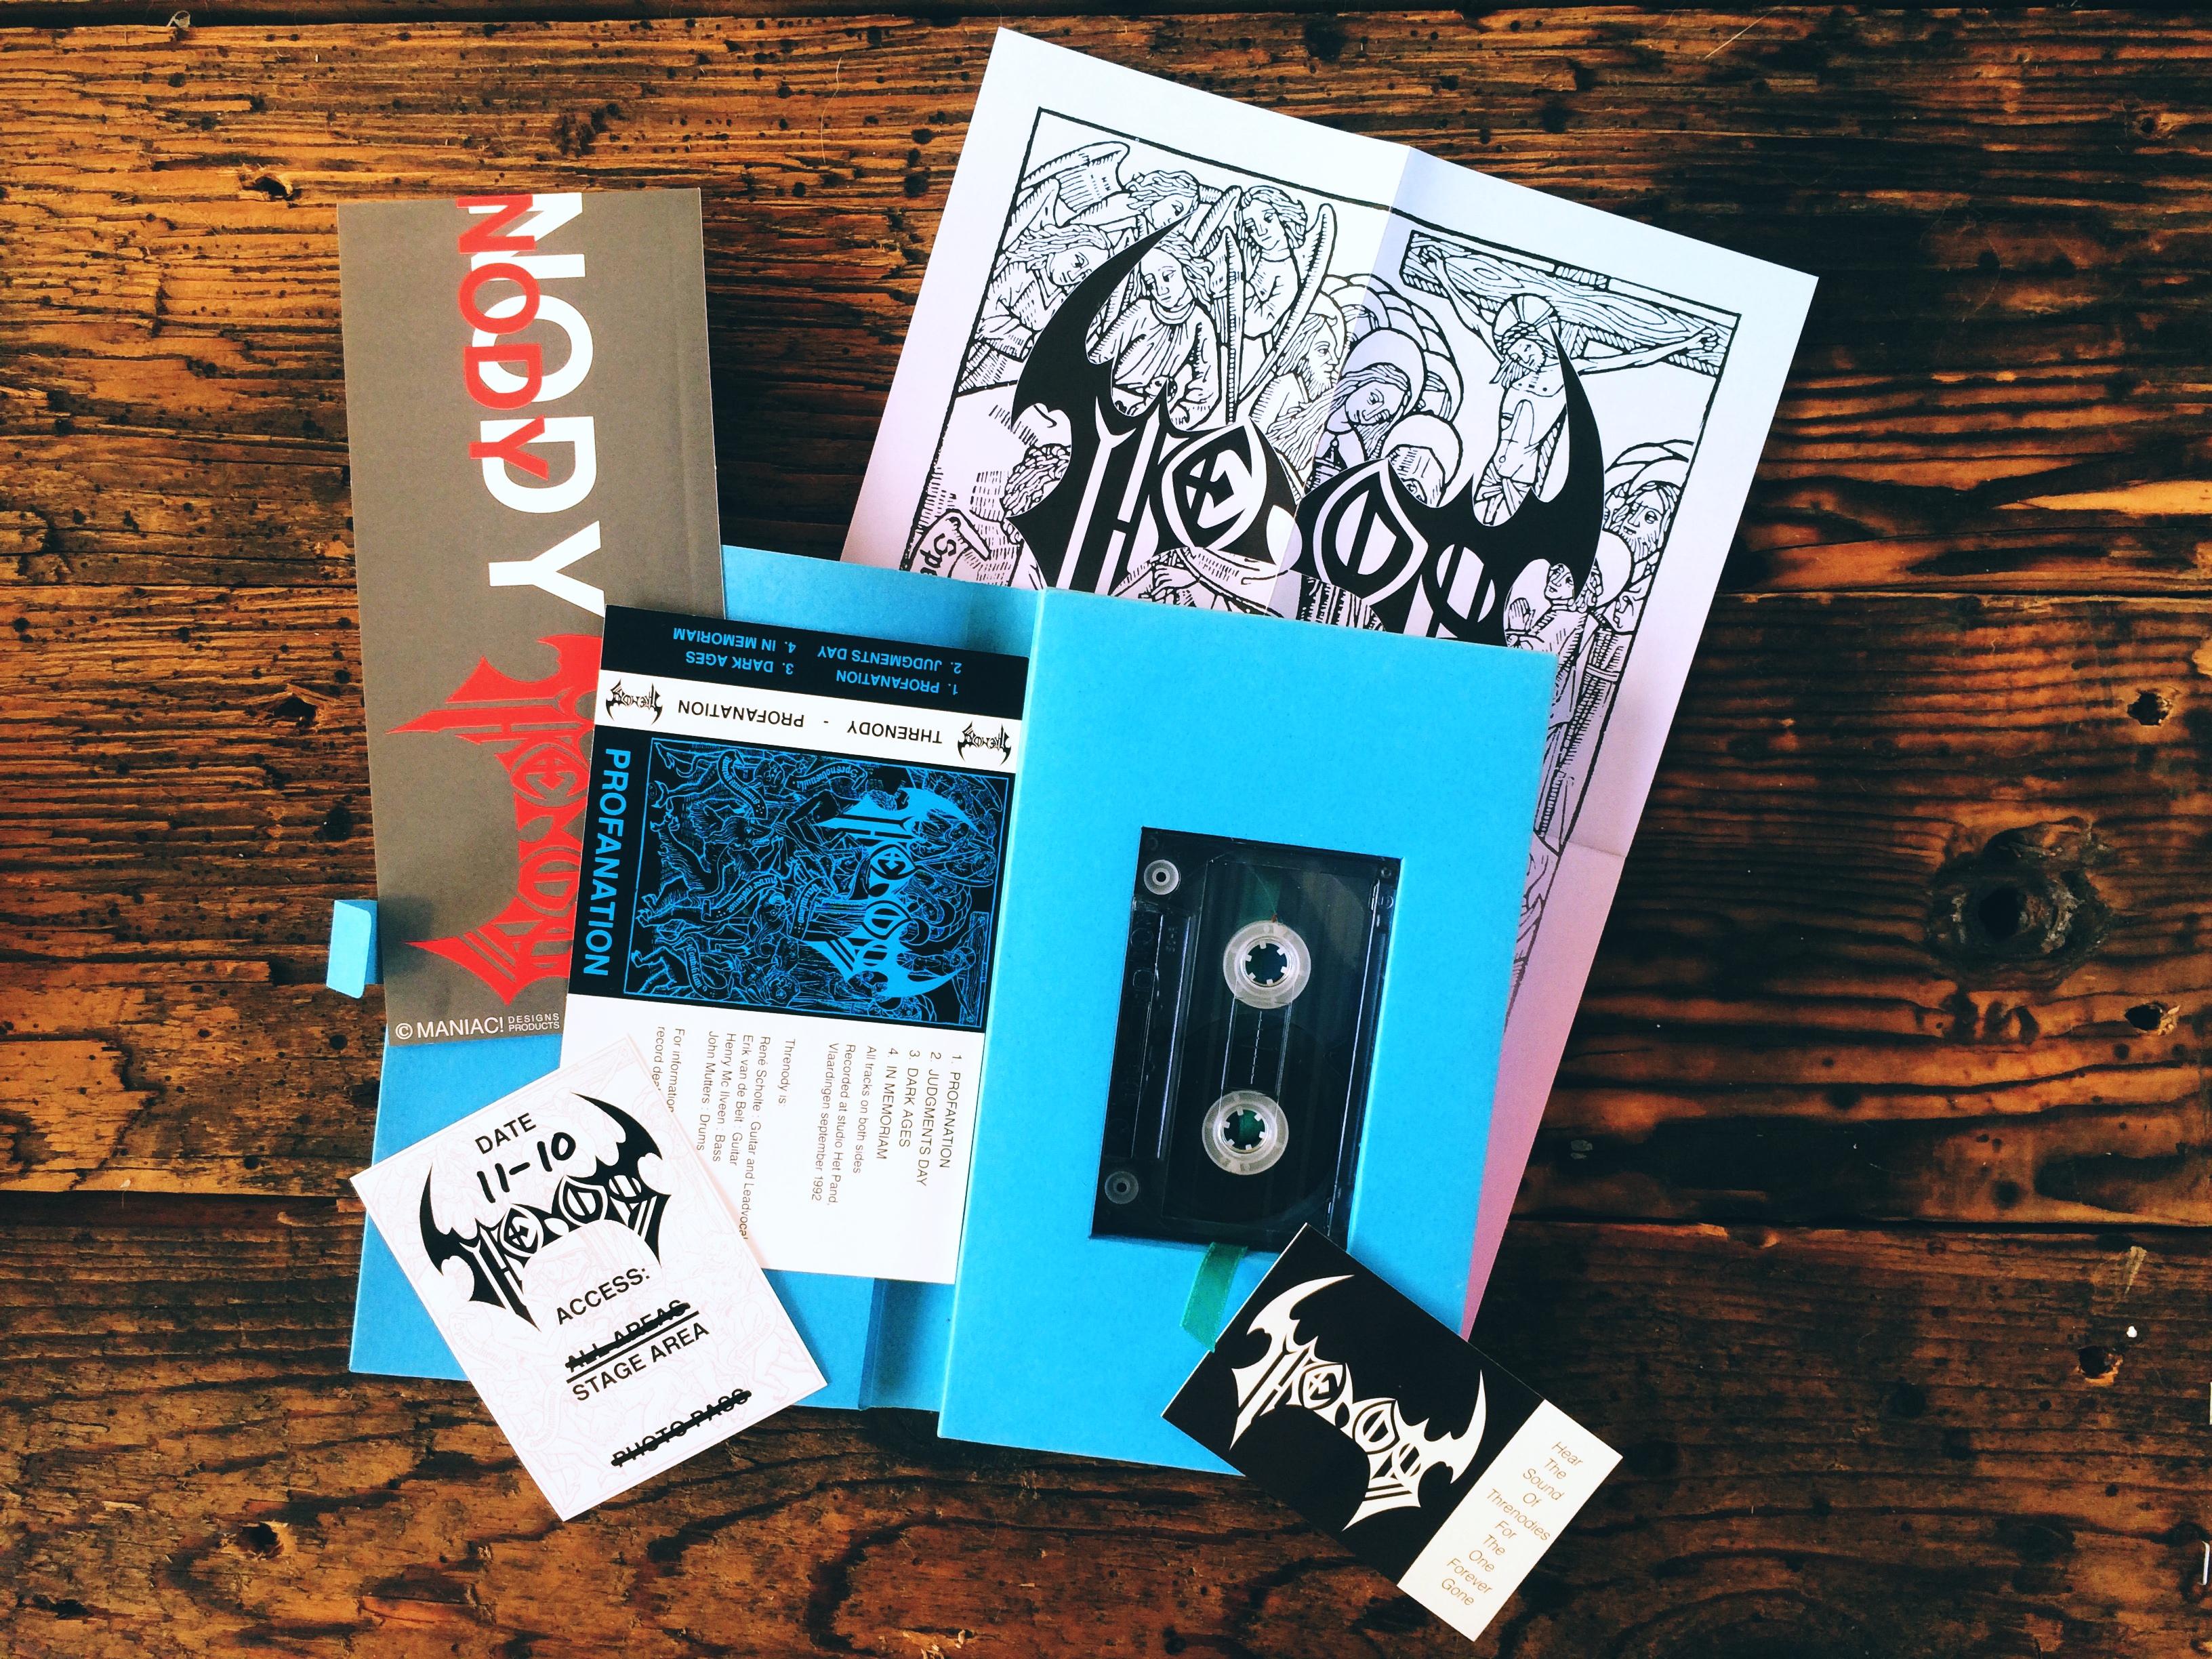 Profanation 1992 - Press kit